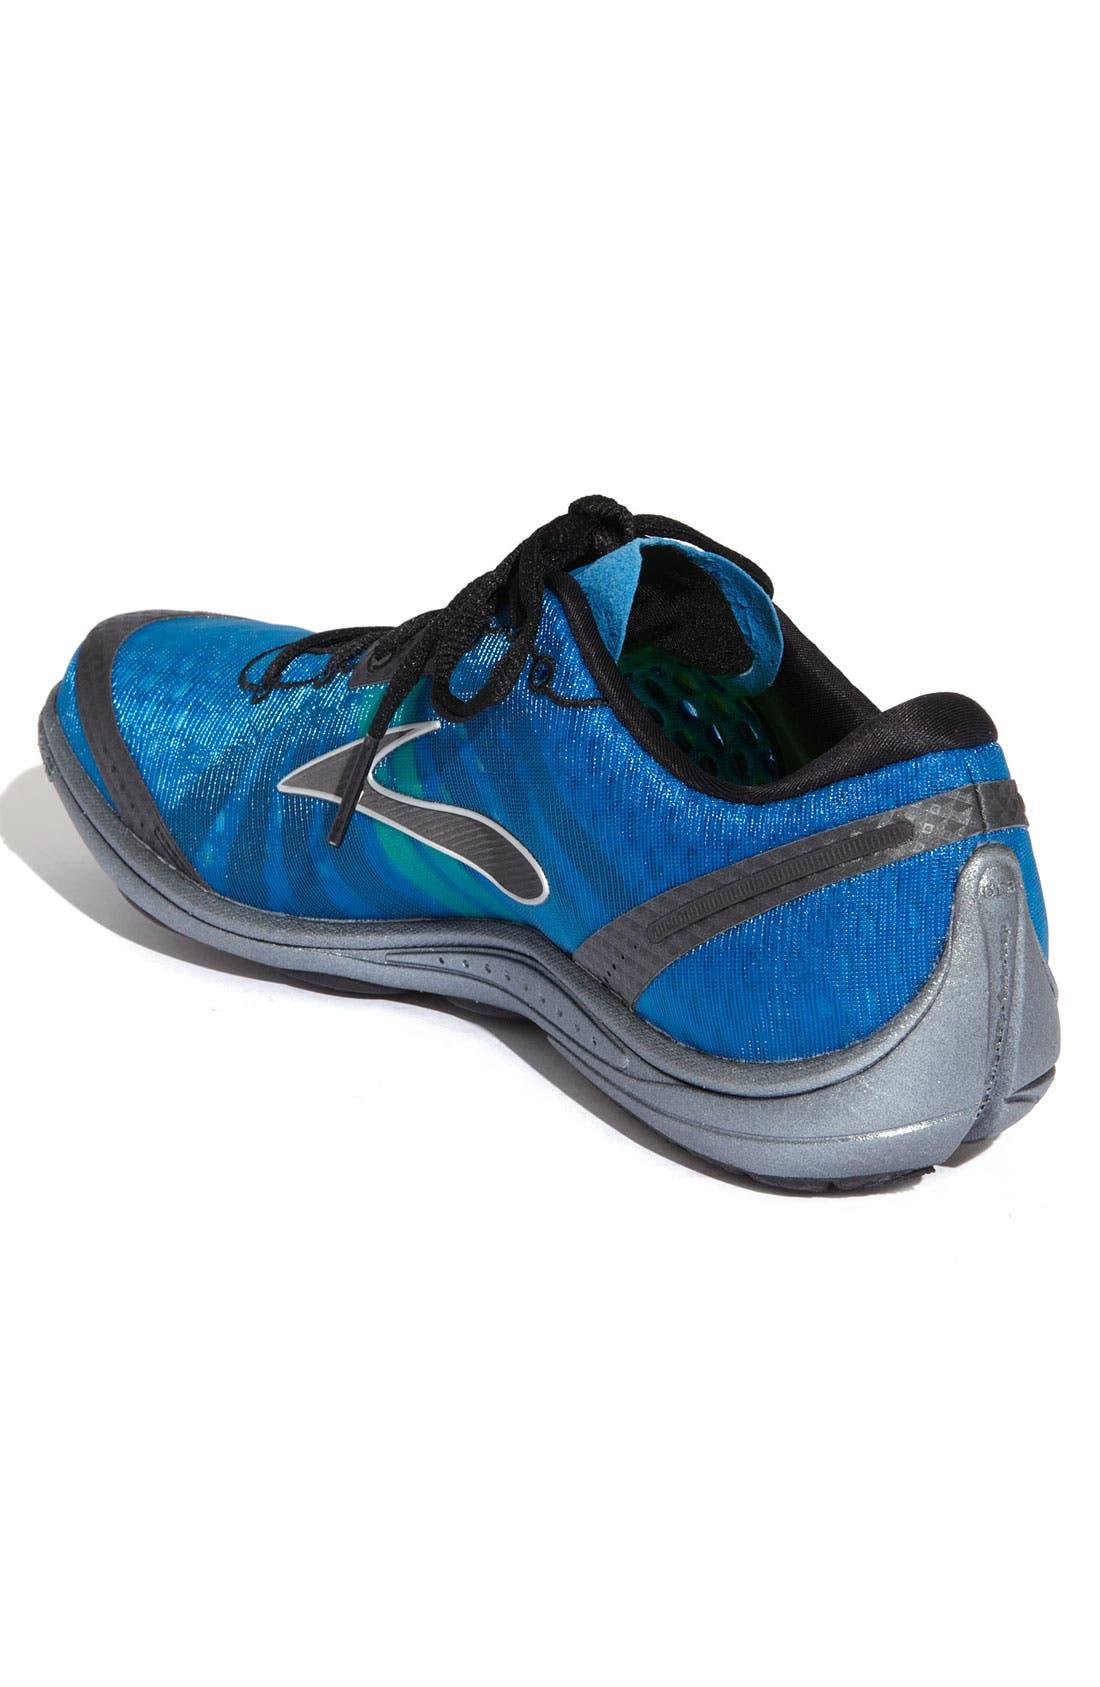 Alternate Image 2  - Brooks 'PureConnect' Running Shoe (Men)